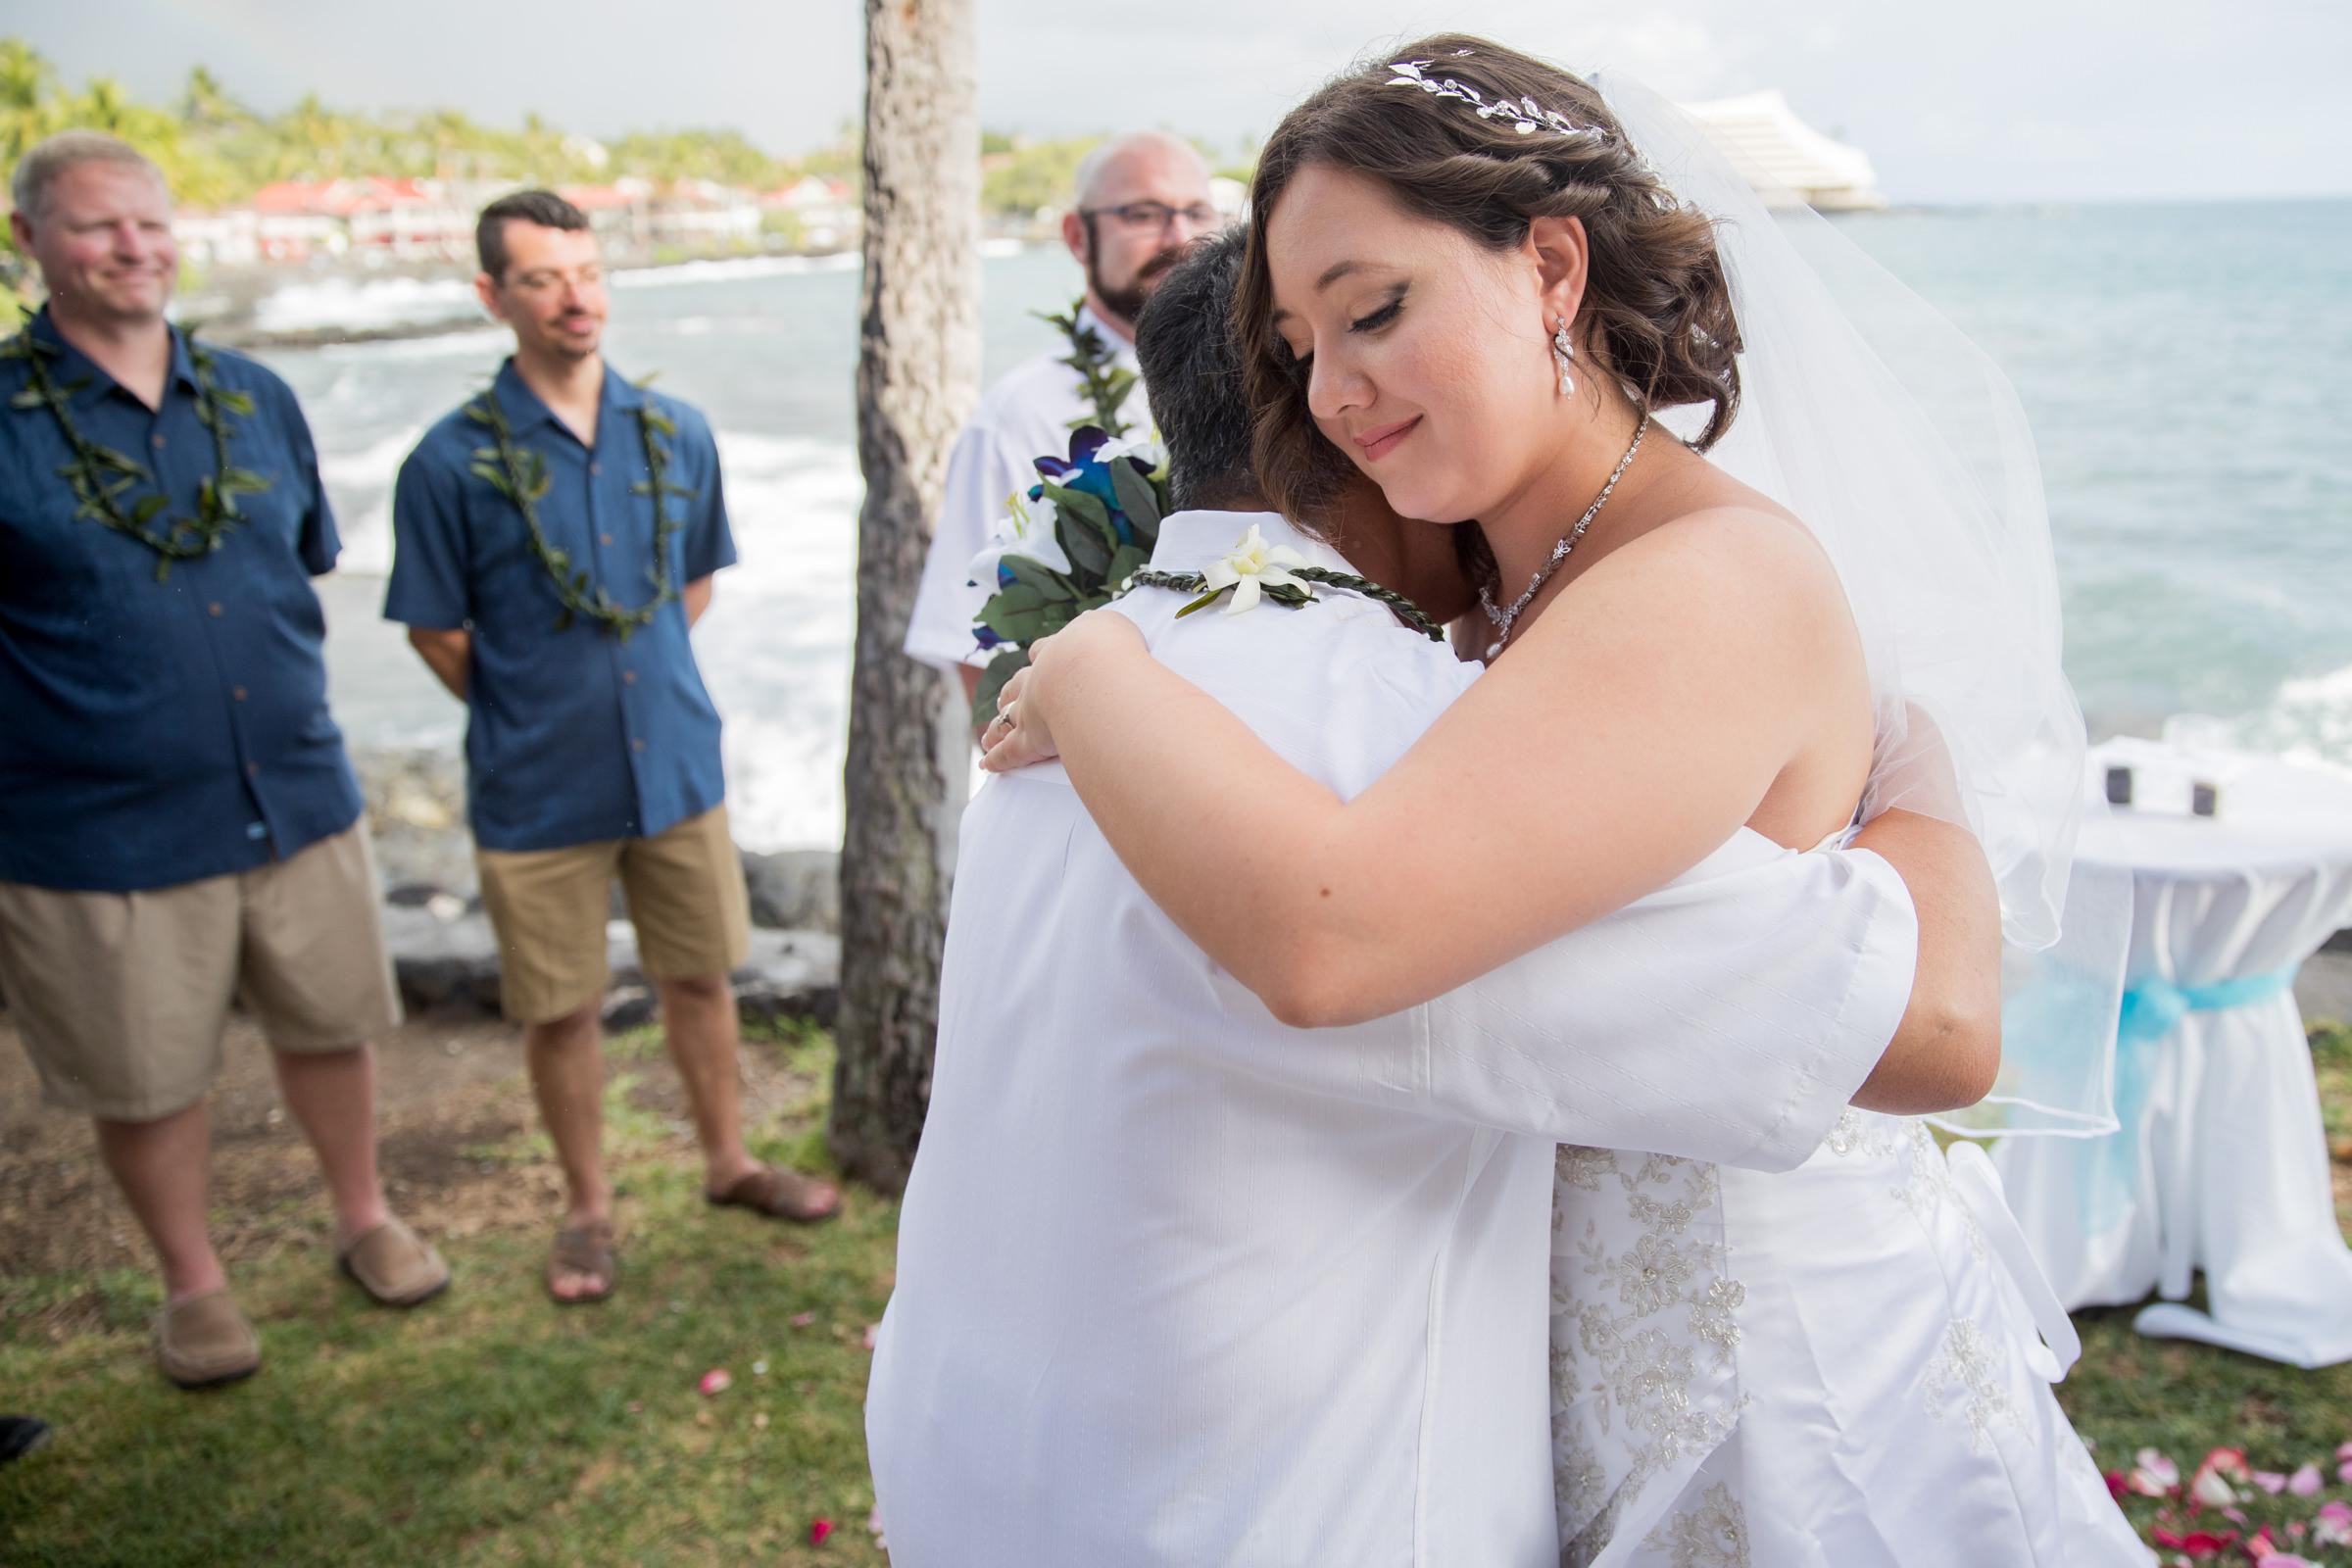 wedding-photographer-photography-destination-hawaii-lake-tahoe-ceremony-